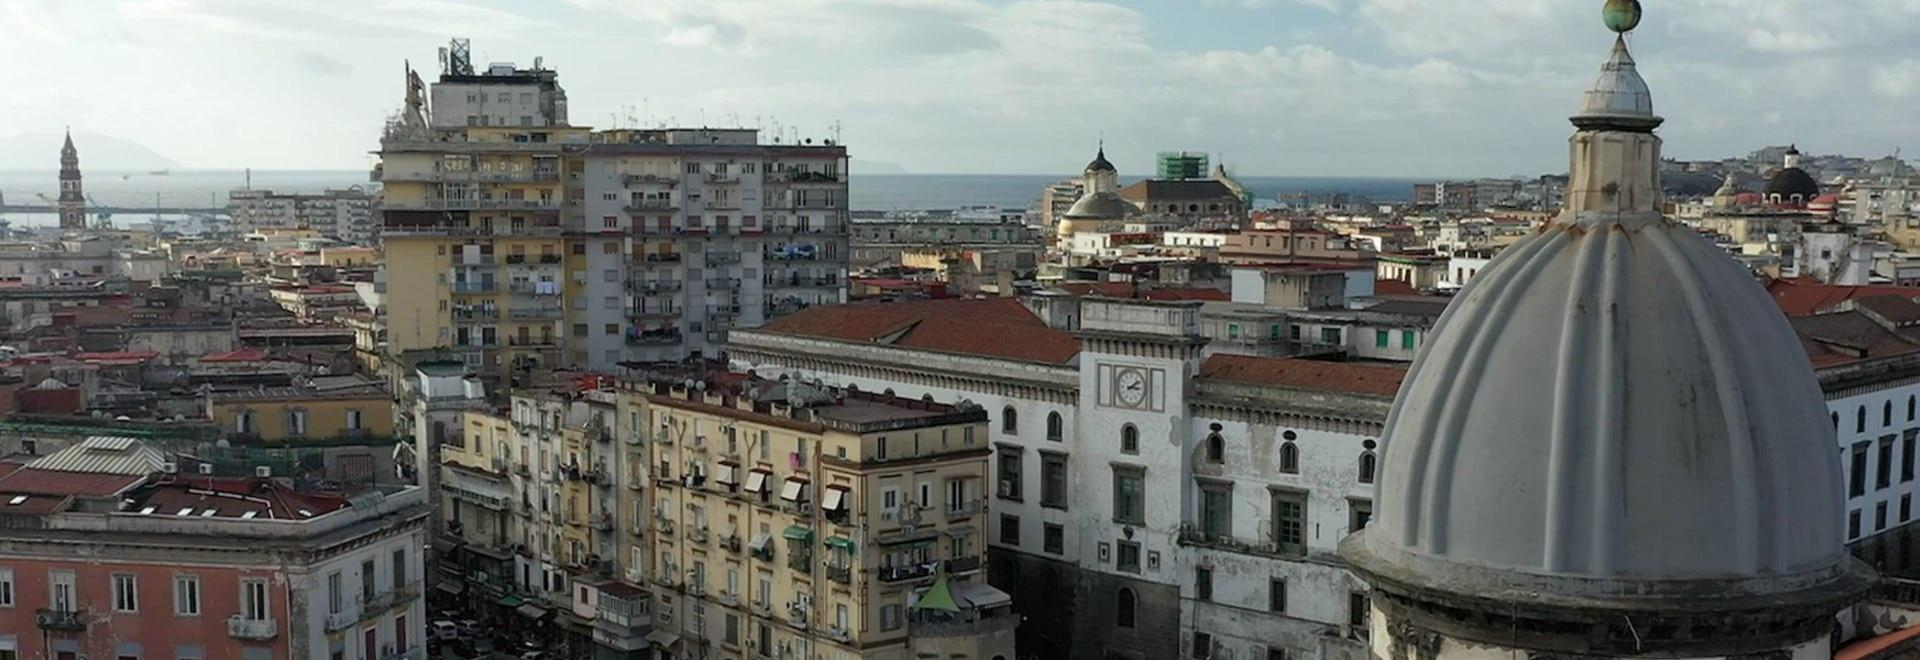 Castel Nuovo - La Napoli medievale